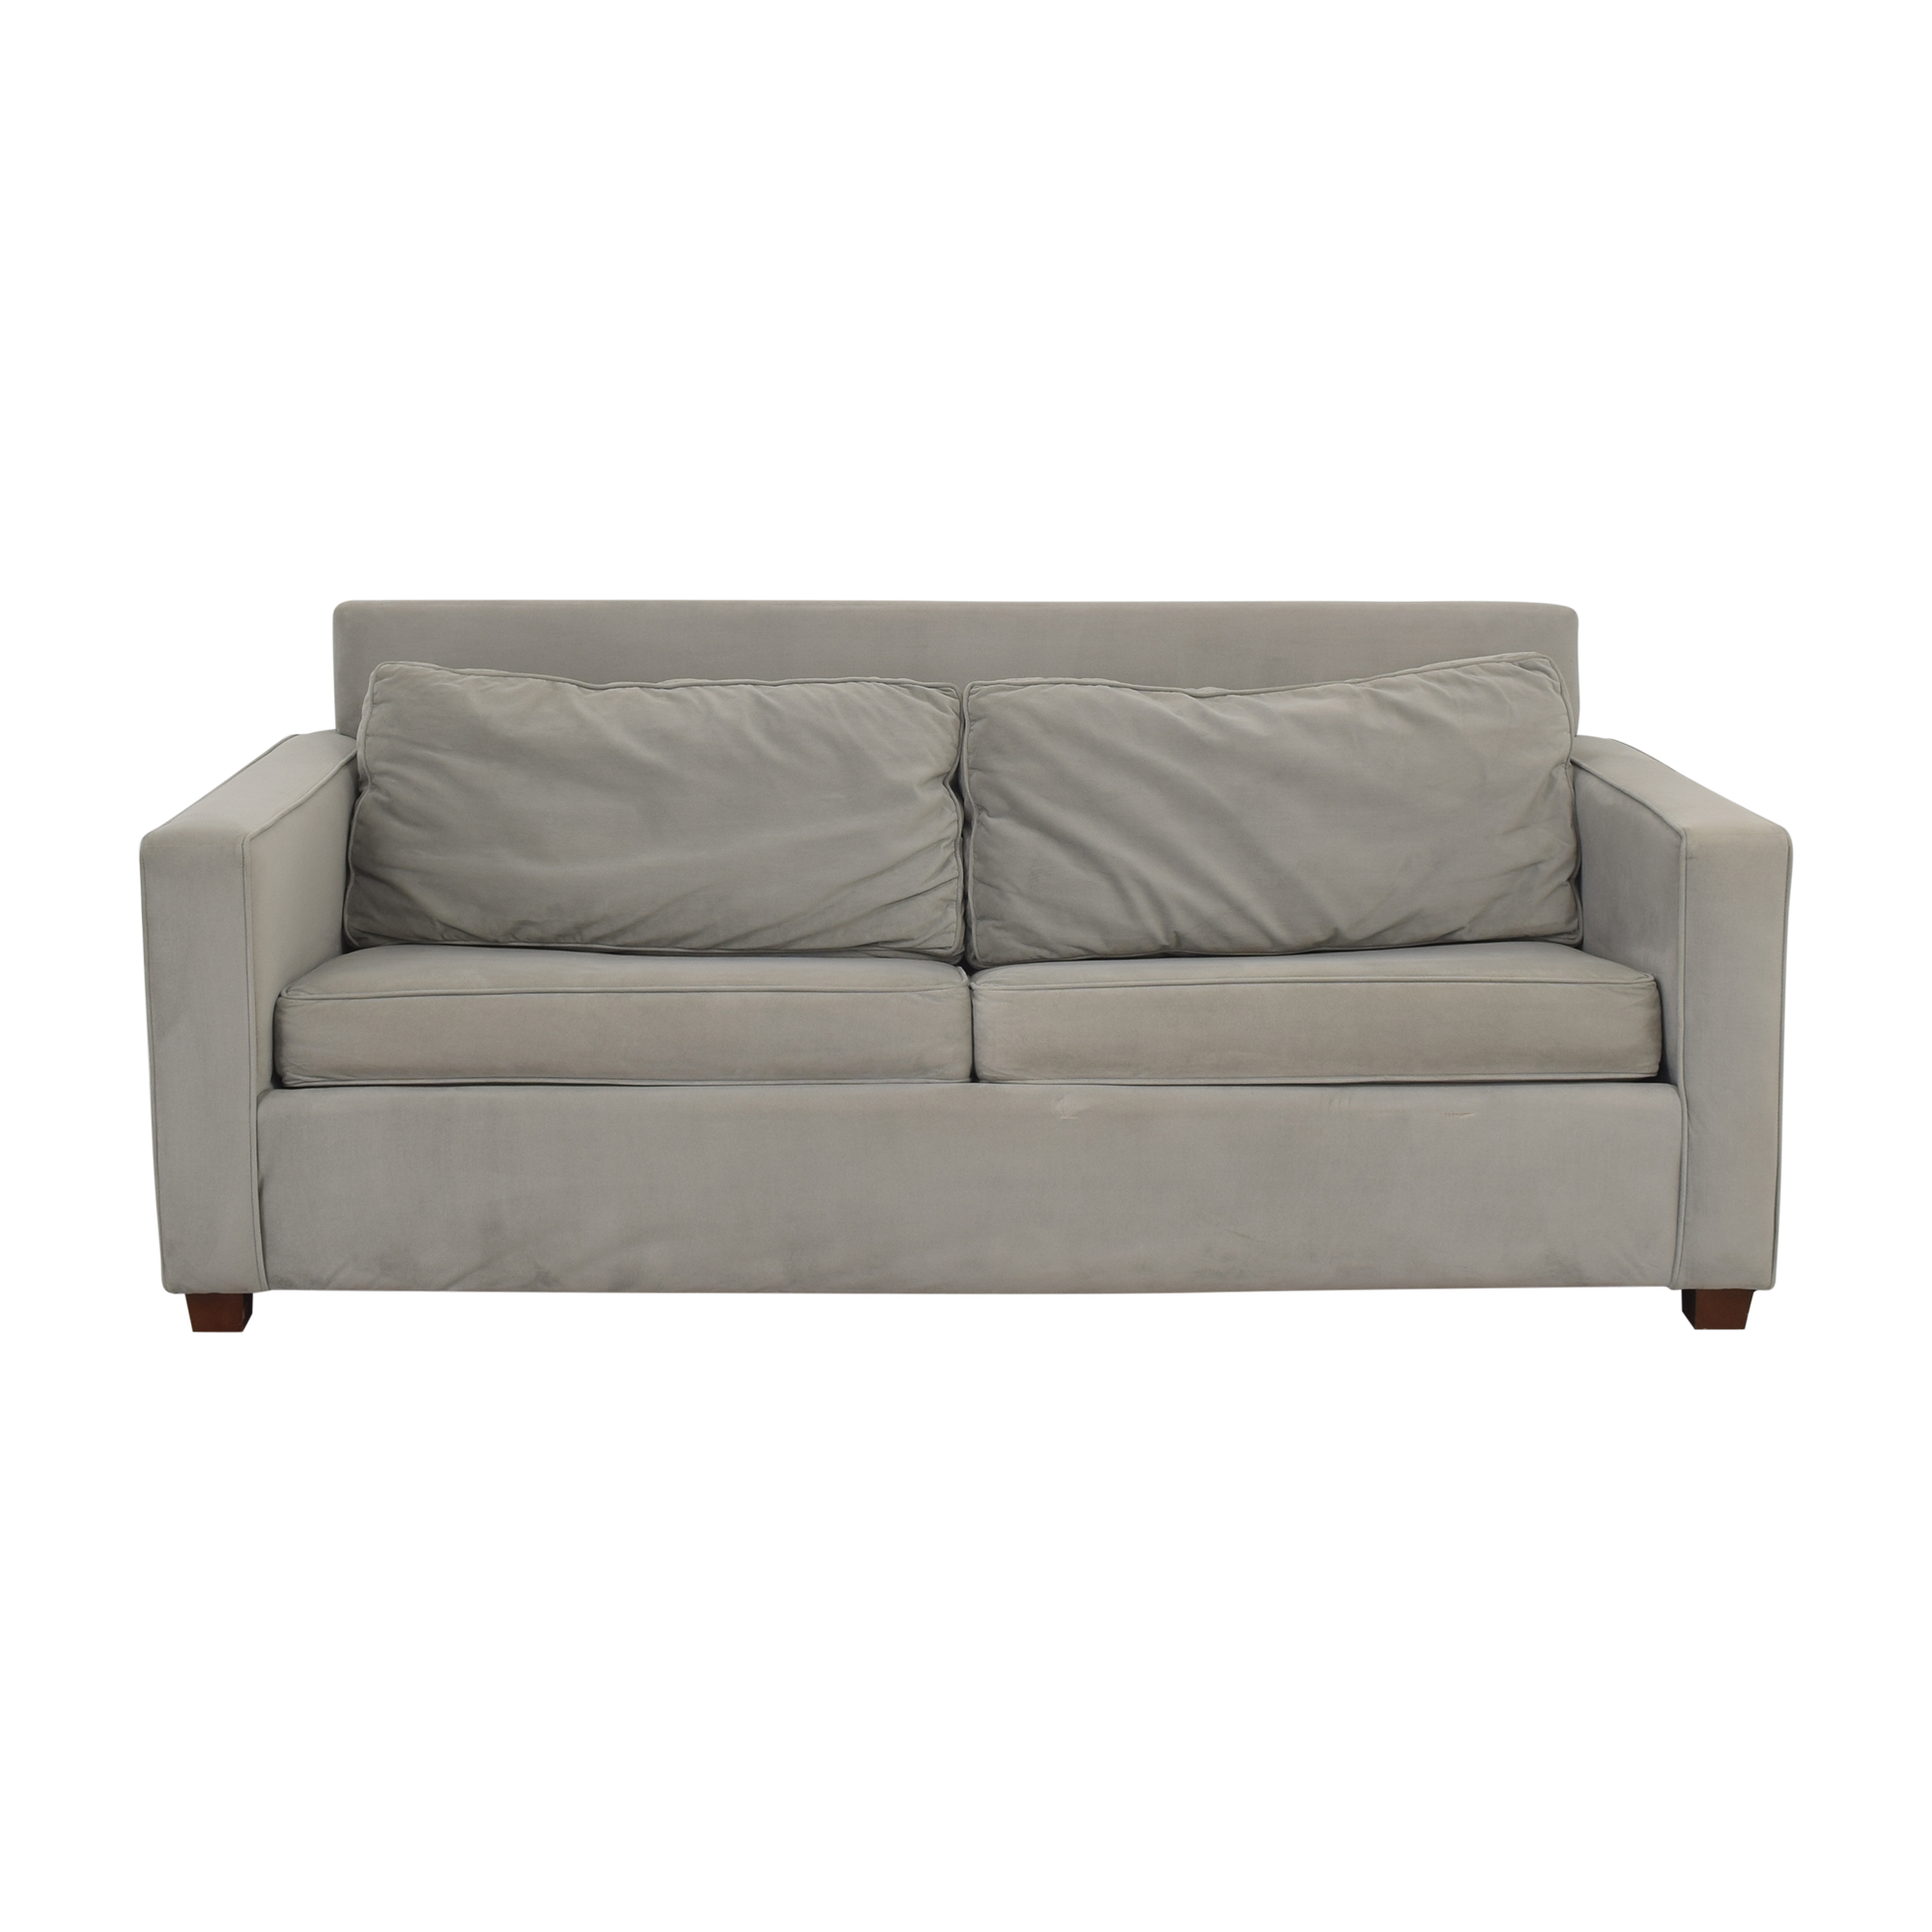 West Elm West Elm Henry Sleeper Sofa ct